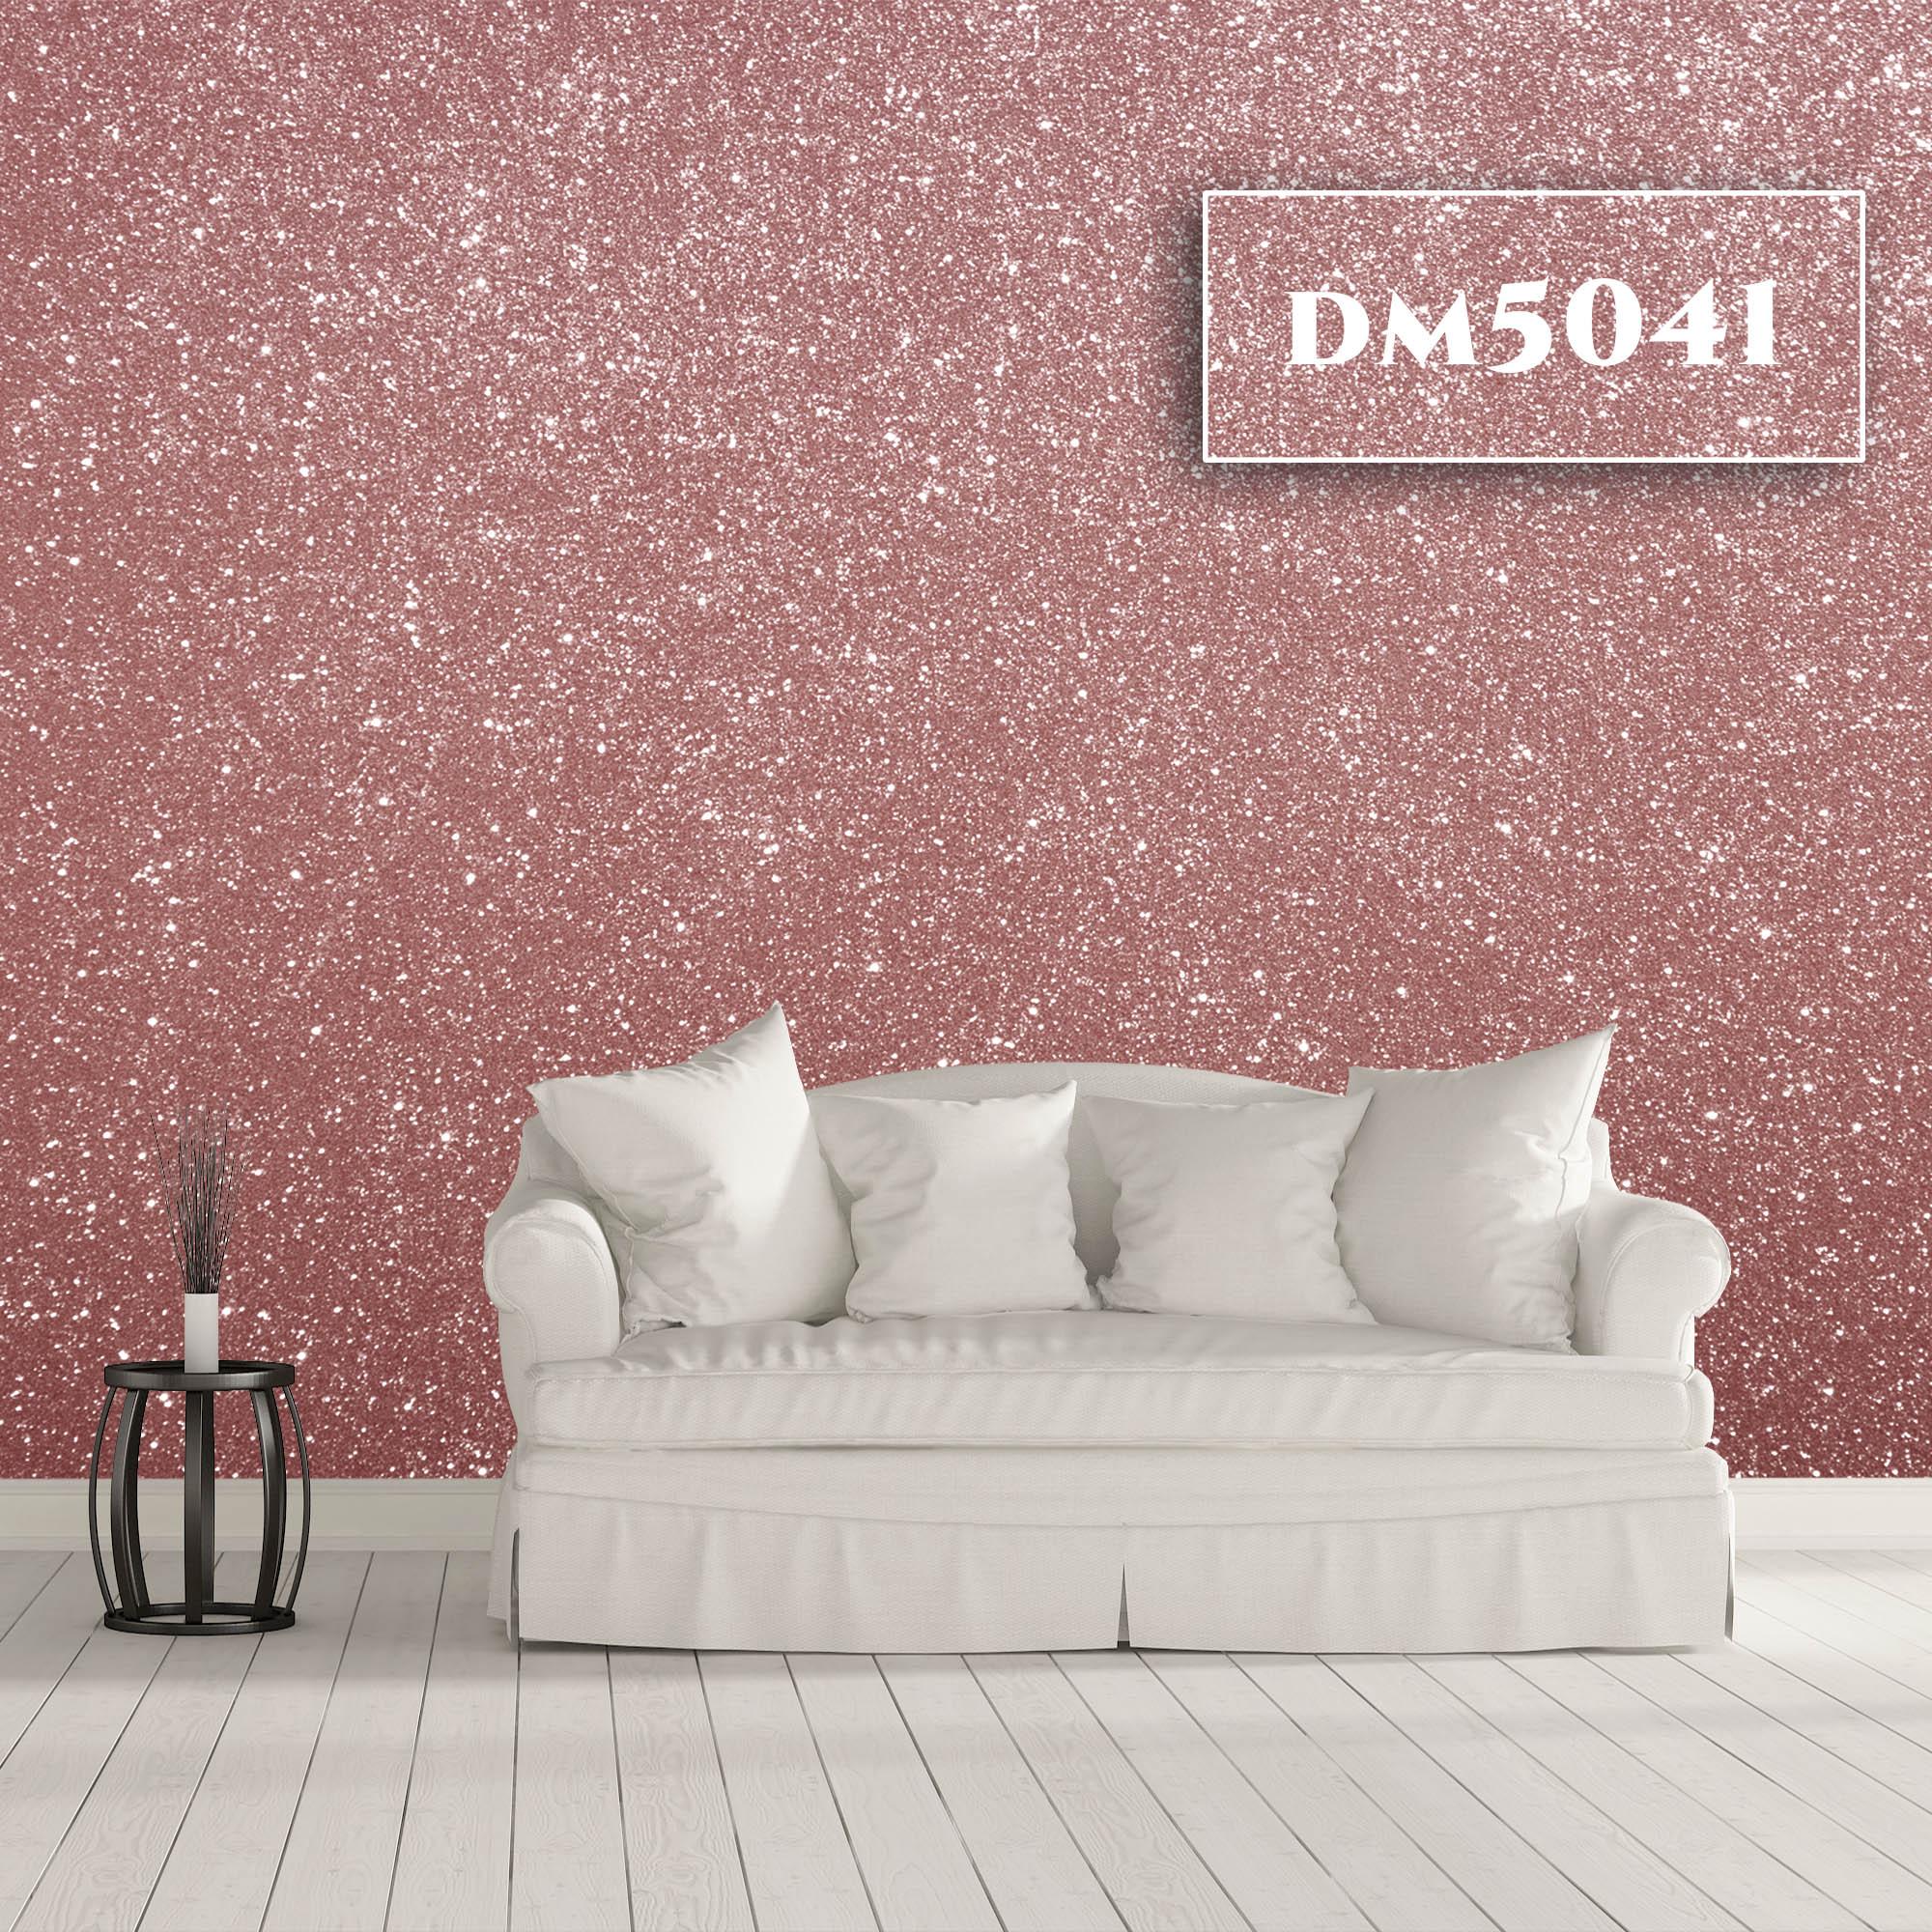 DM5041